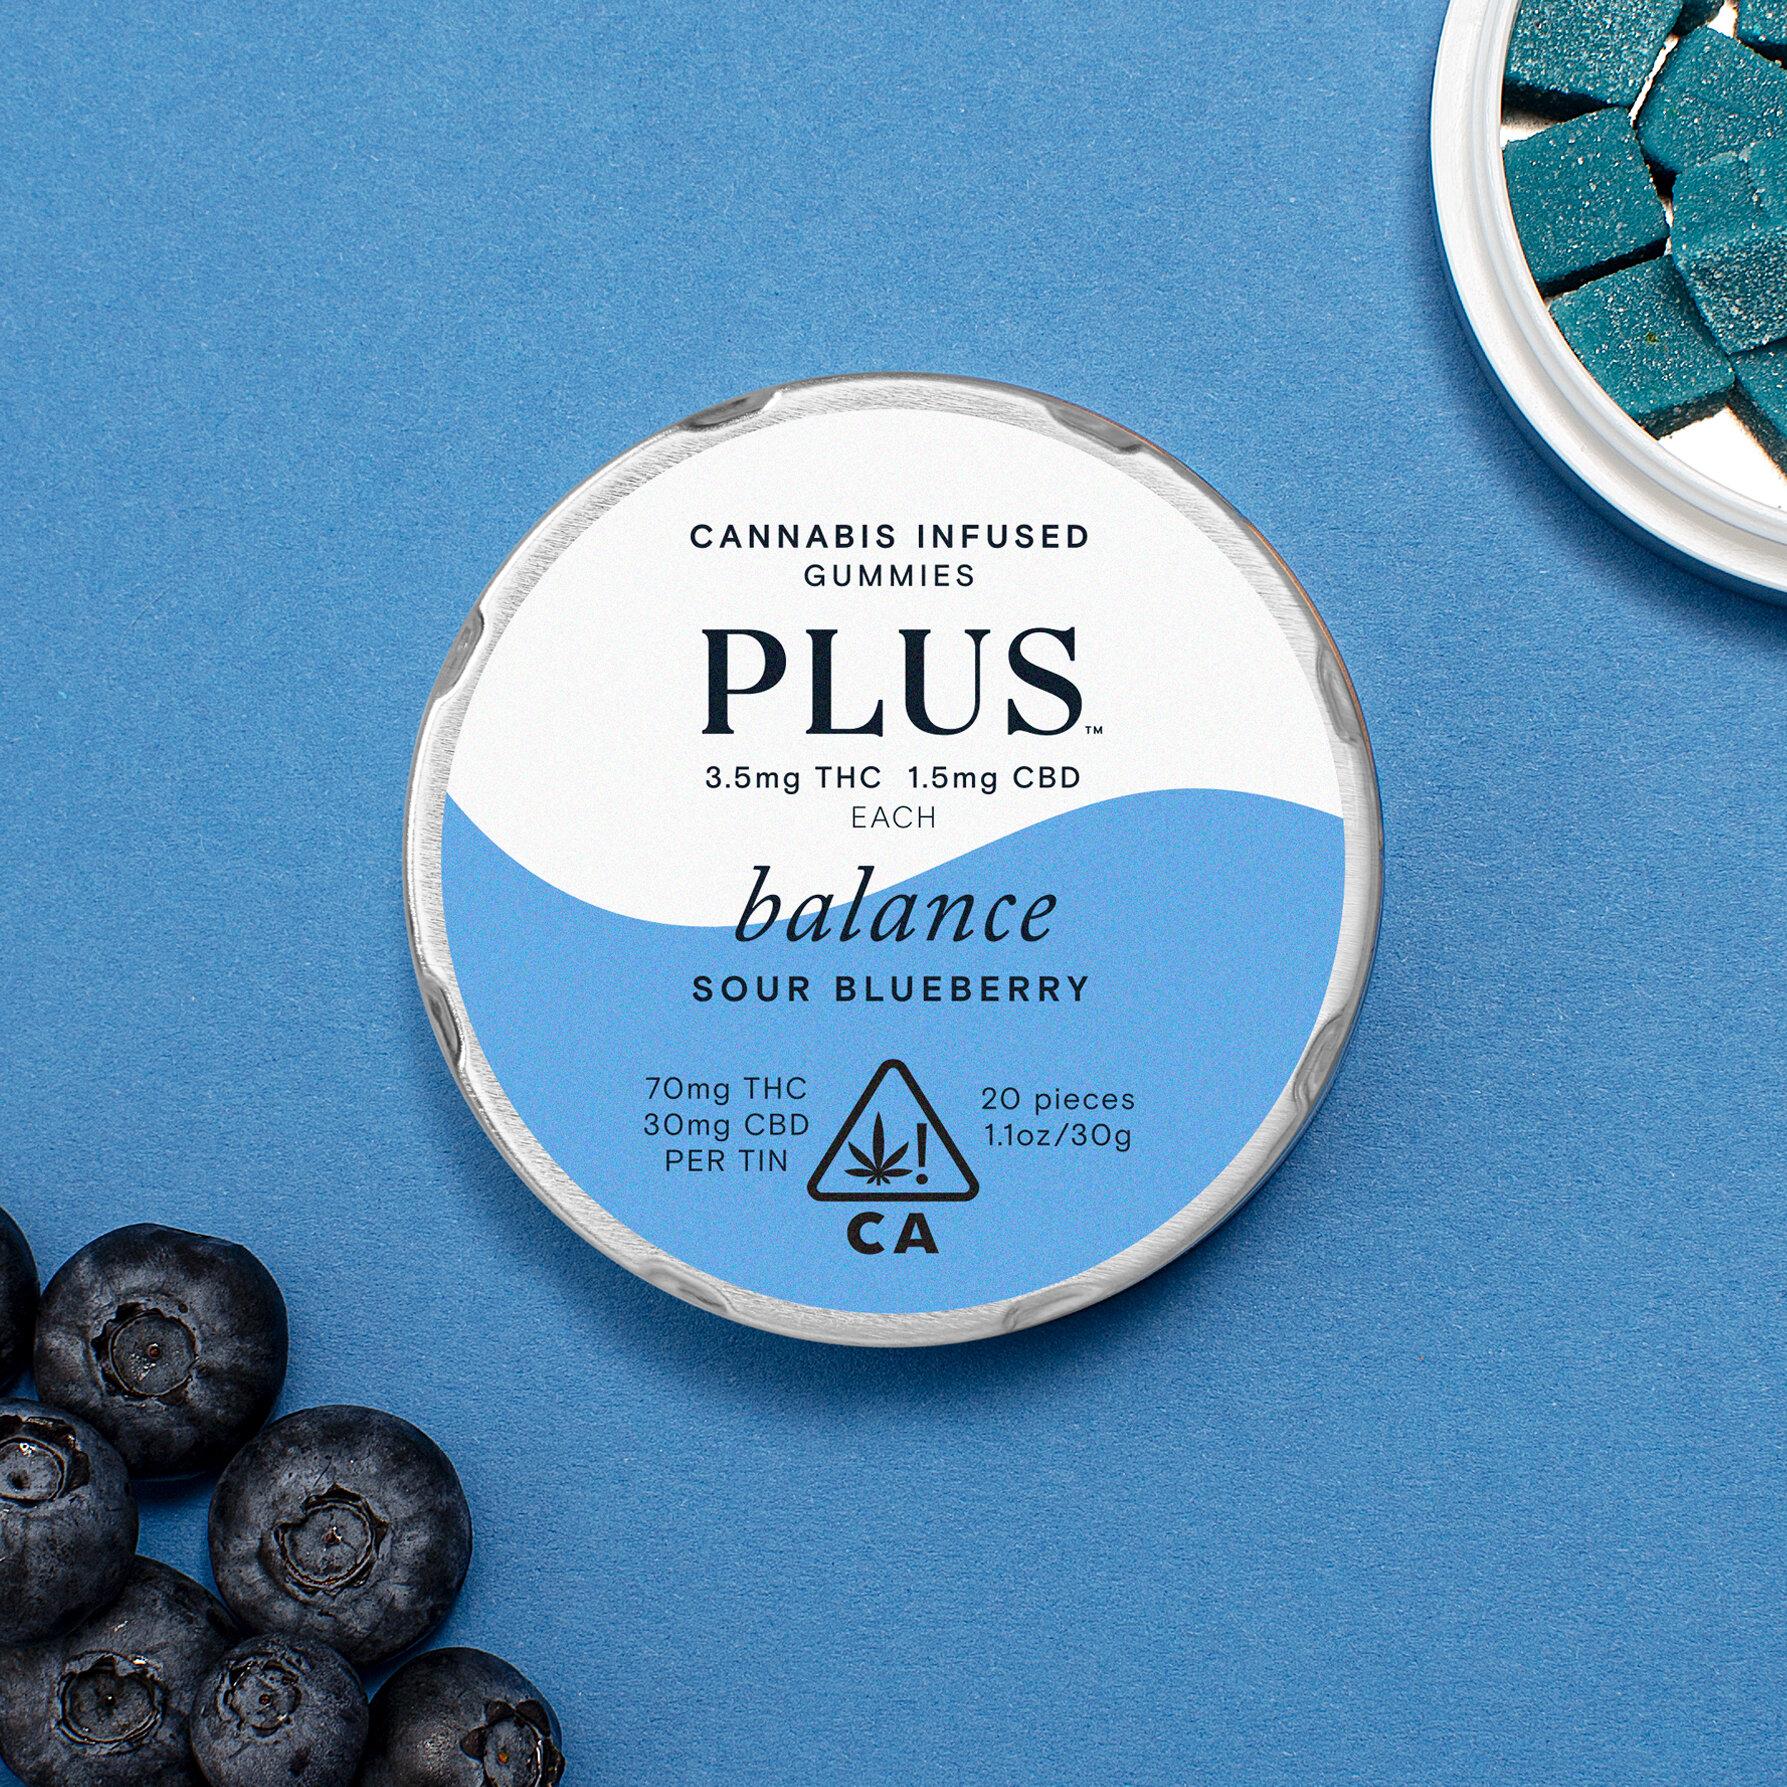 gummies_balance_sour blueberry.jpg